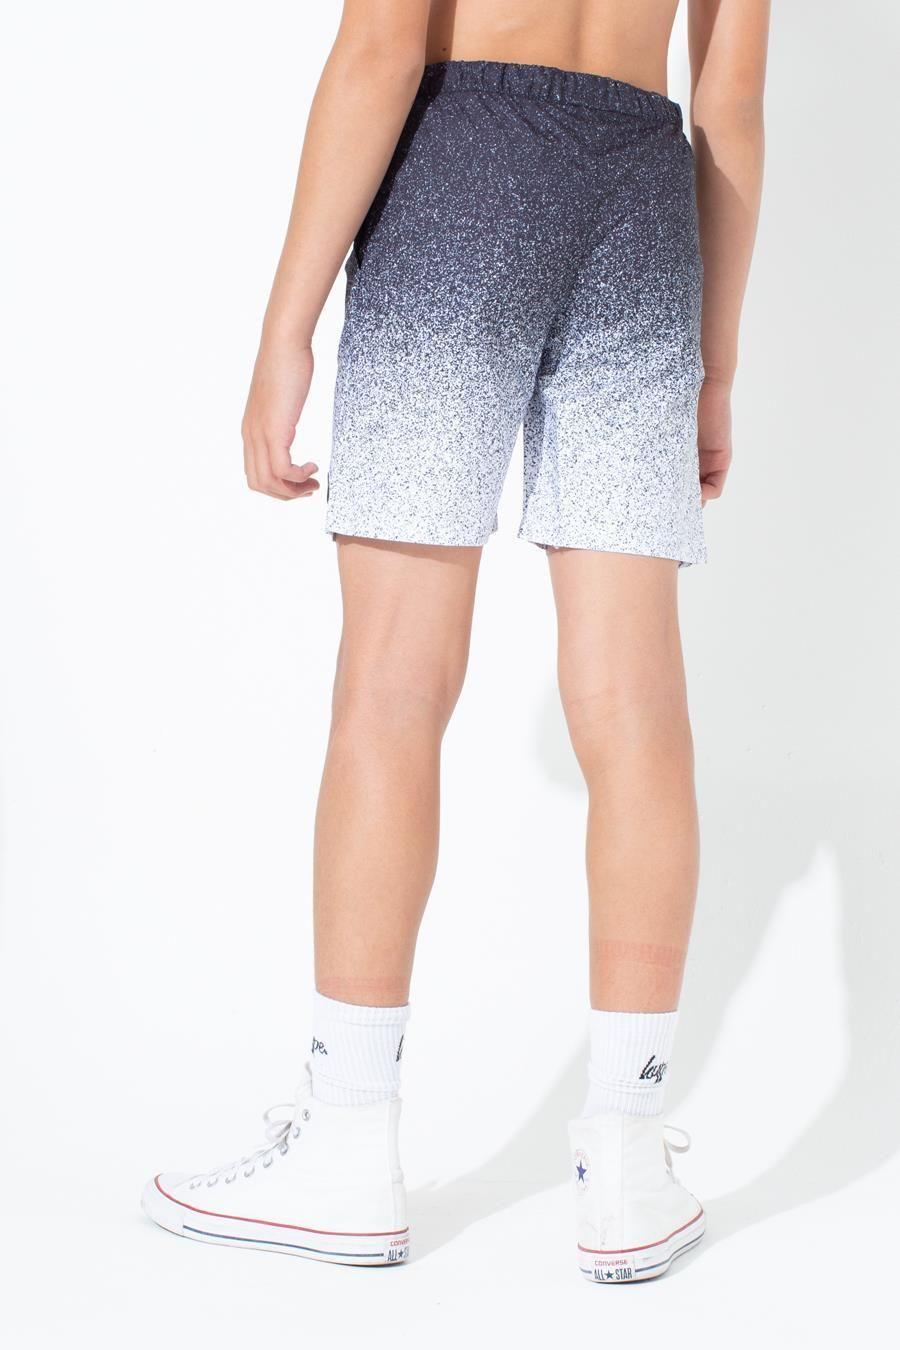 Hype Speckle Fade Kids Swim Shorts